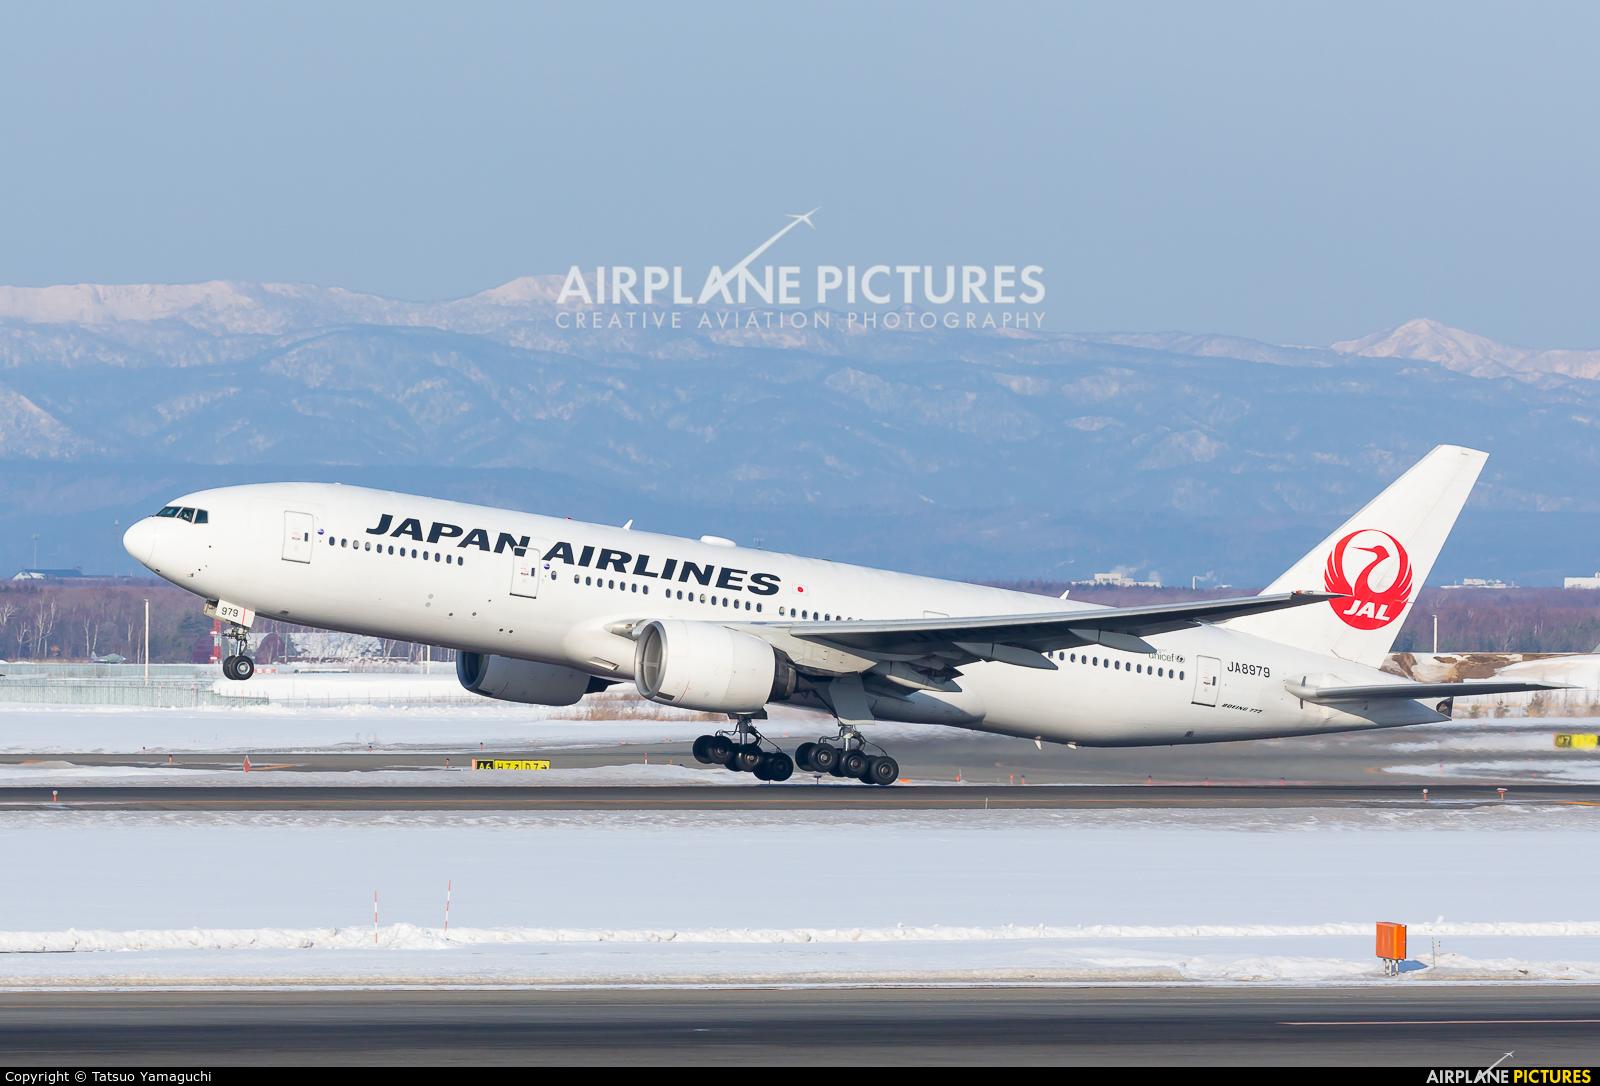 JAL - Japan Airlines JA8979 aircraft at New Chitose